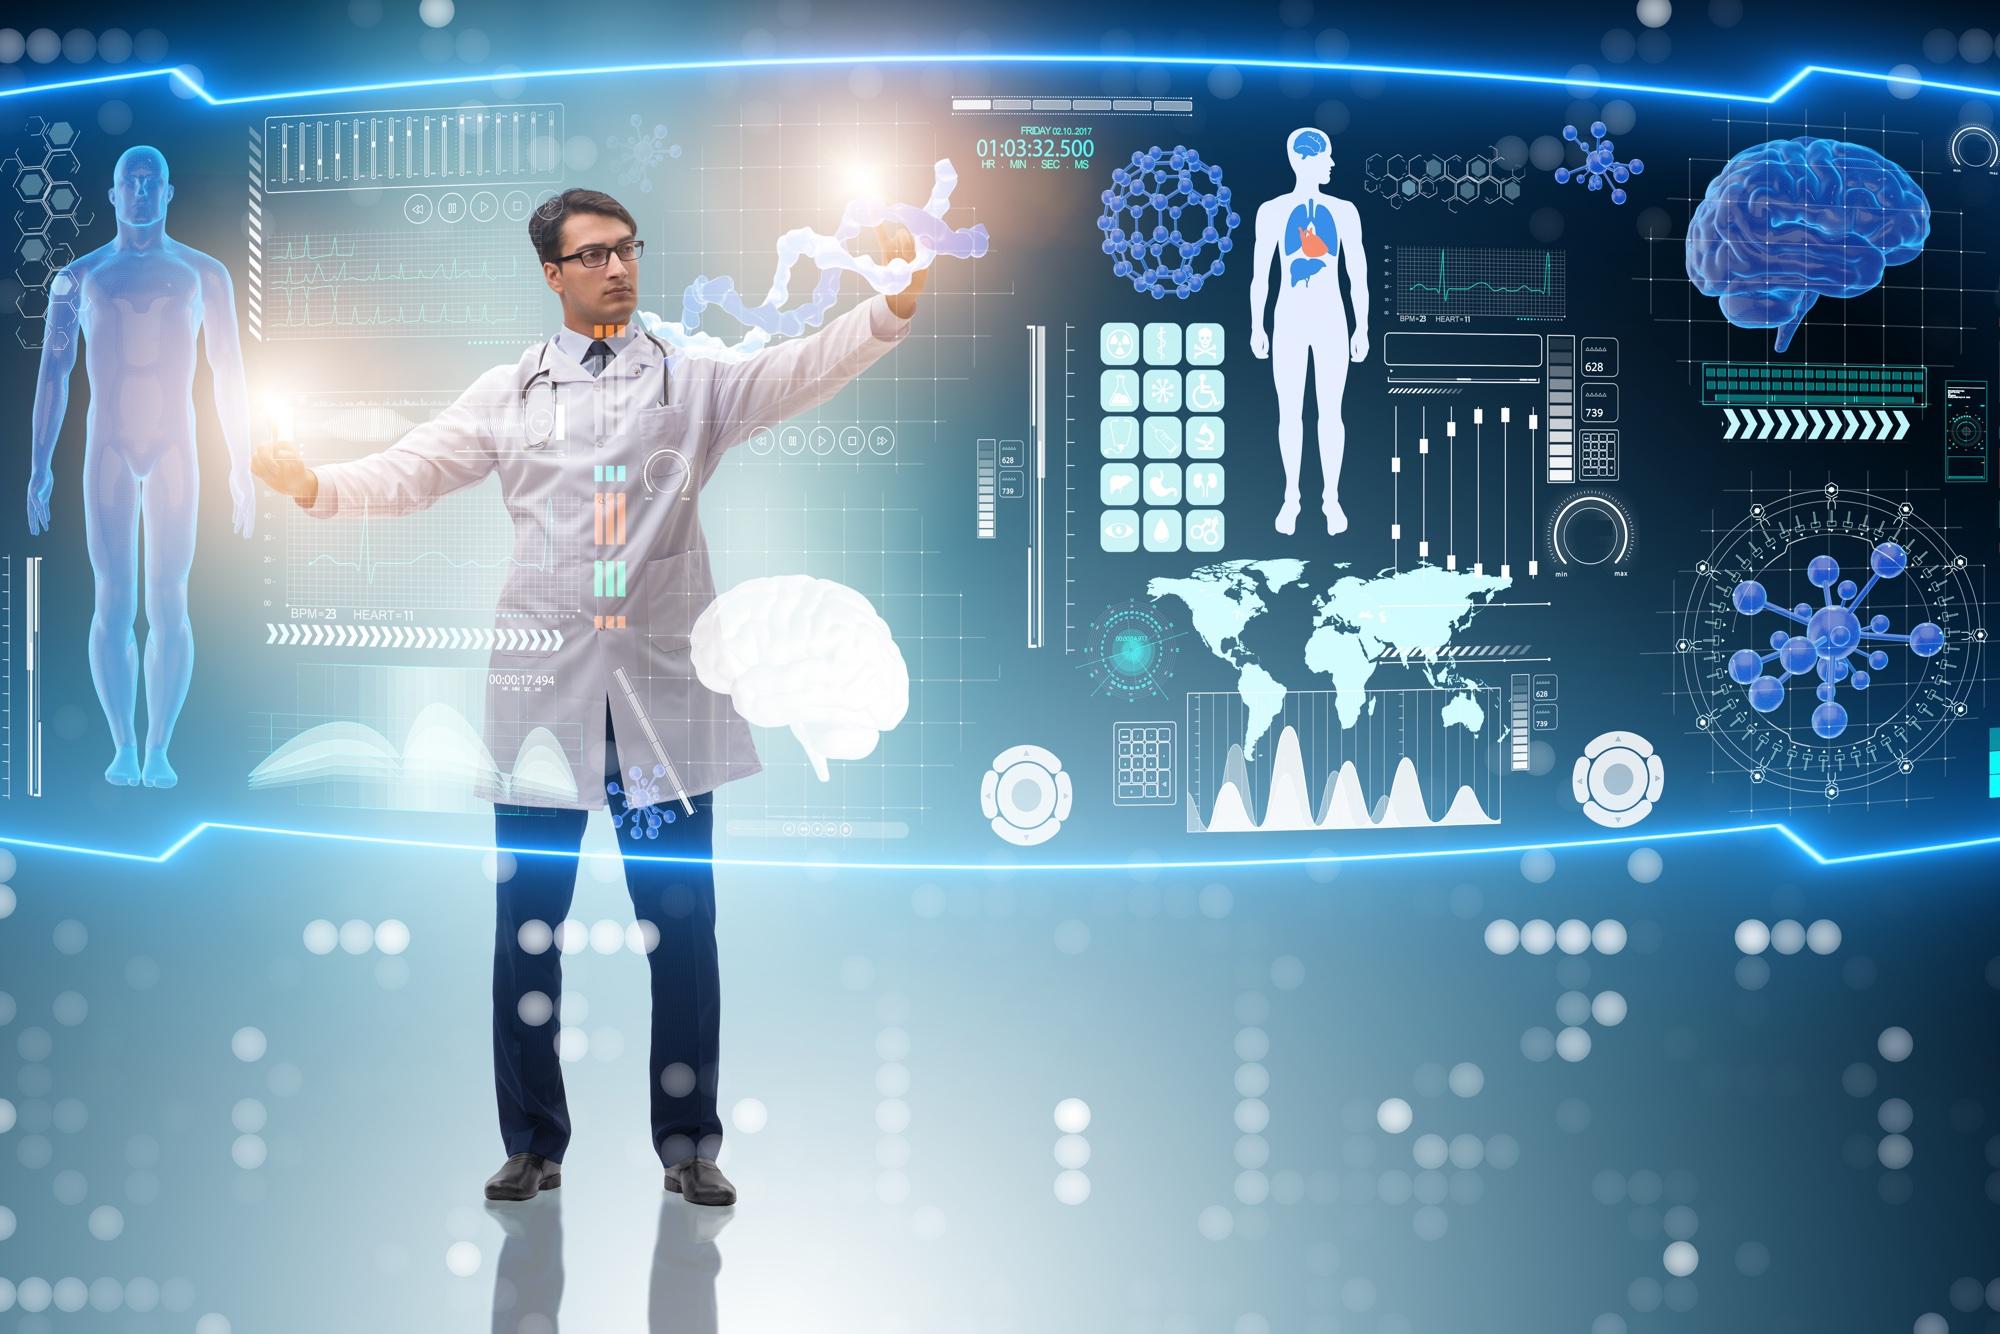 О проекте «Цифровое здравоохранение»